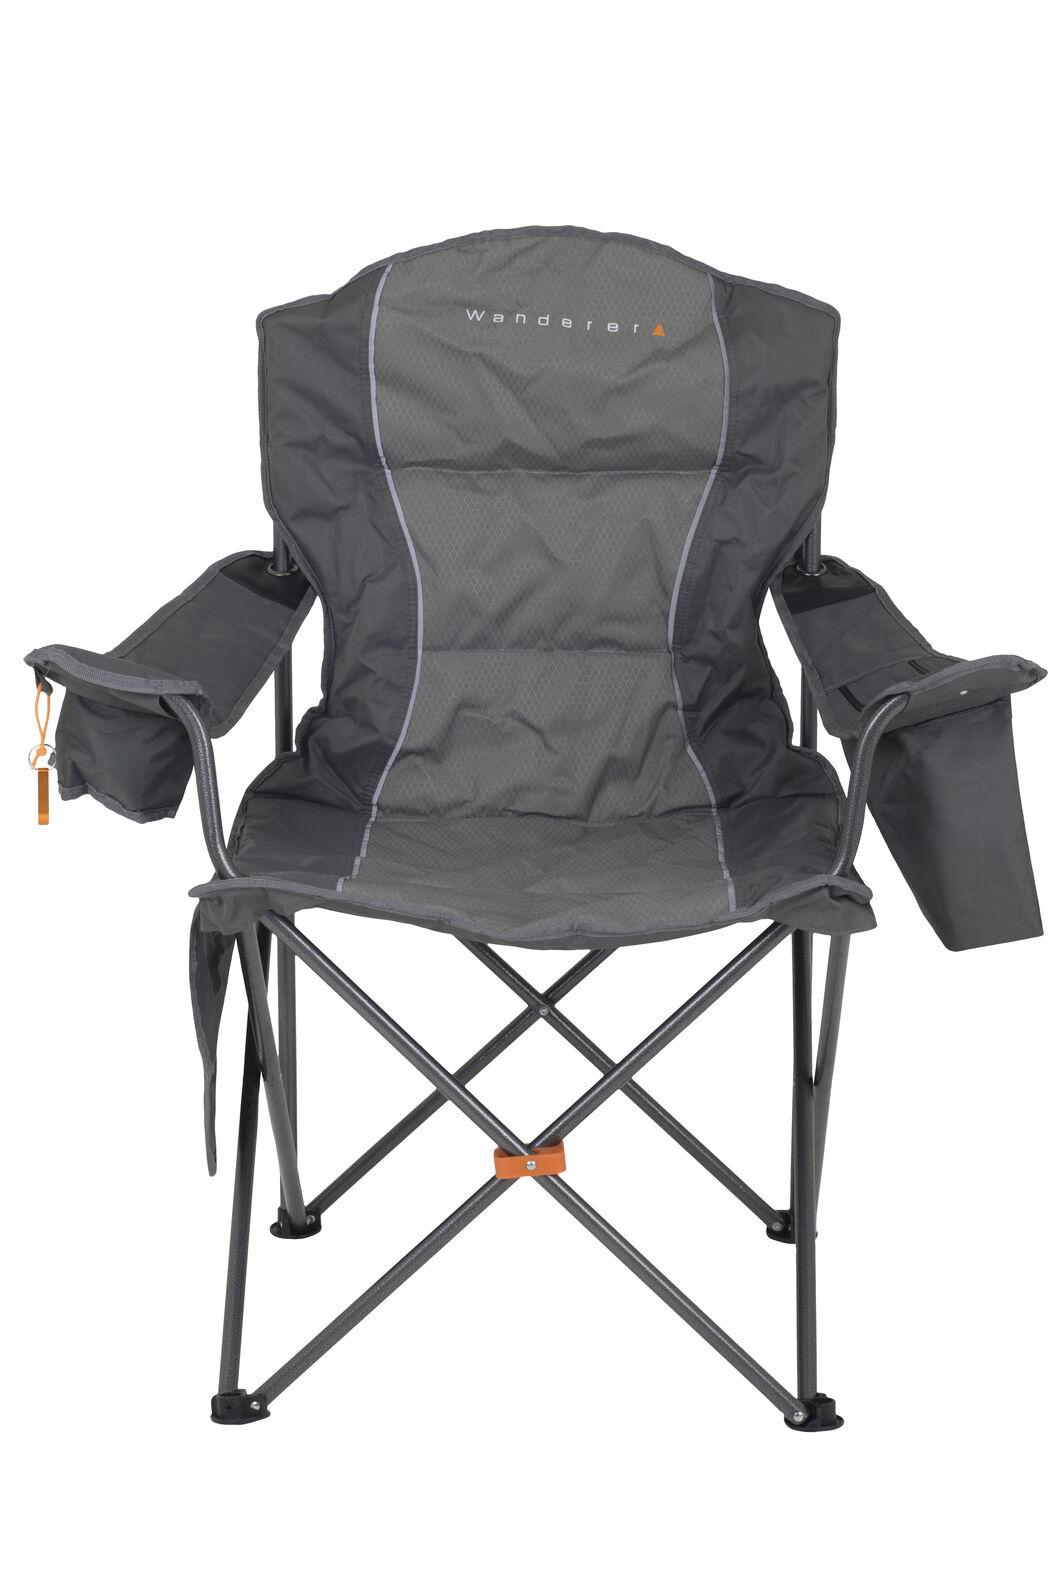 Wanderer Premium Cooler Arm Chair, None, hi-res